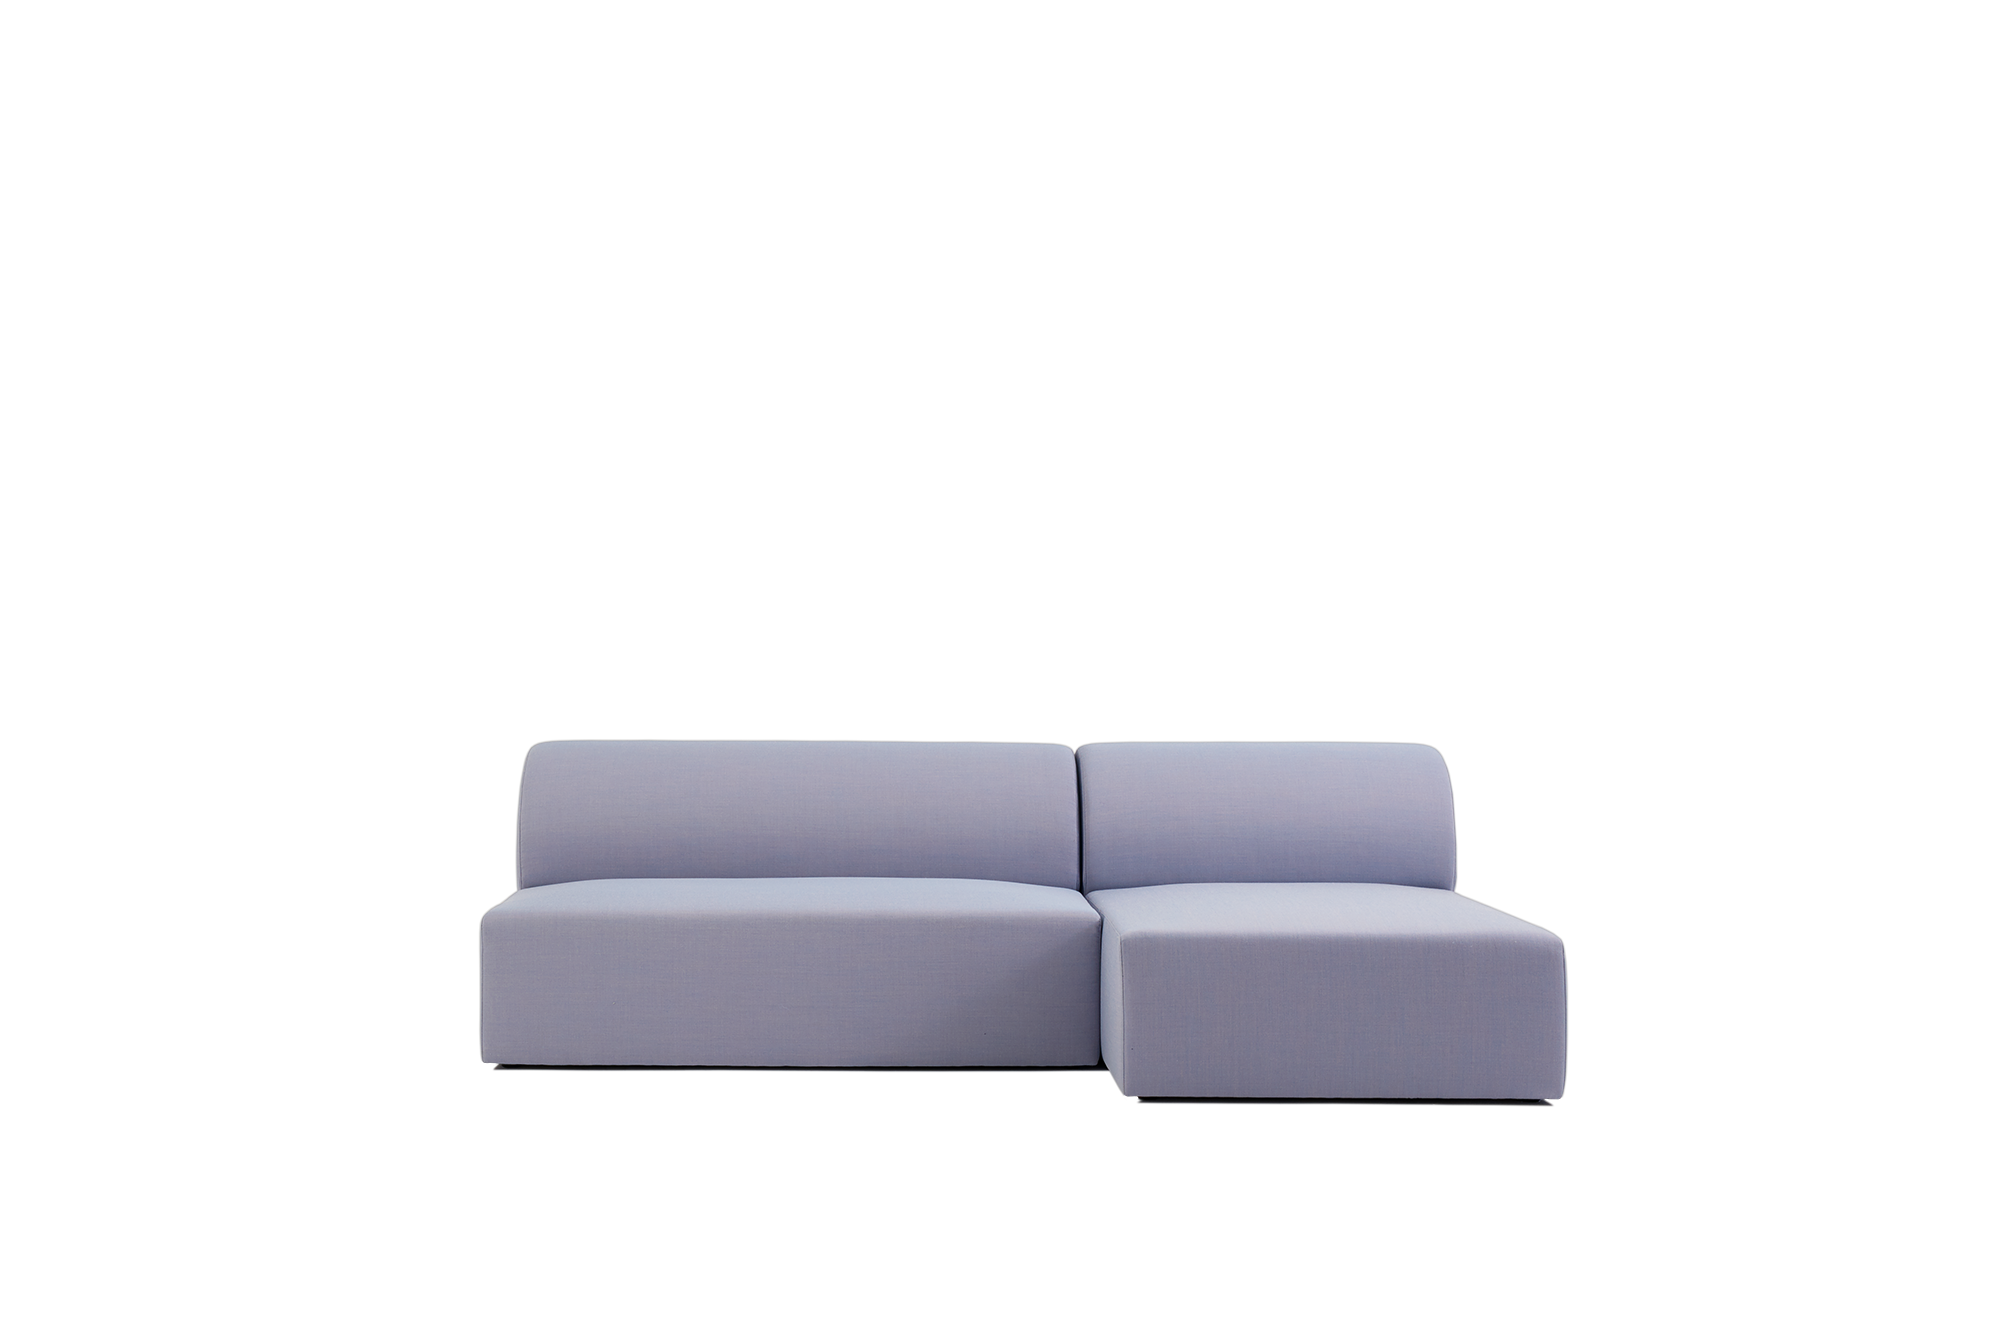 Full Size of Modulares Sofa Ikea Lennon Dhel Kissen Leder Modular Set Flex System Westwing Mit Schlaffunktion Weber Modulsofa Designs Objekte Unserer Tage Baxter 2 5 Sitzer Sofa Modulares Sofa